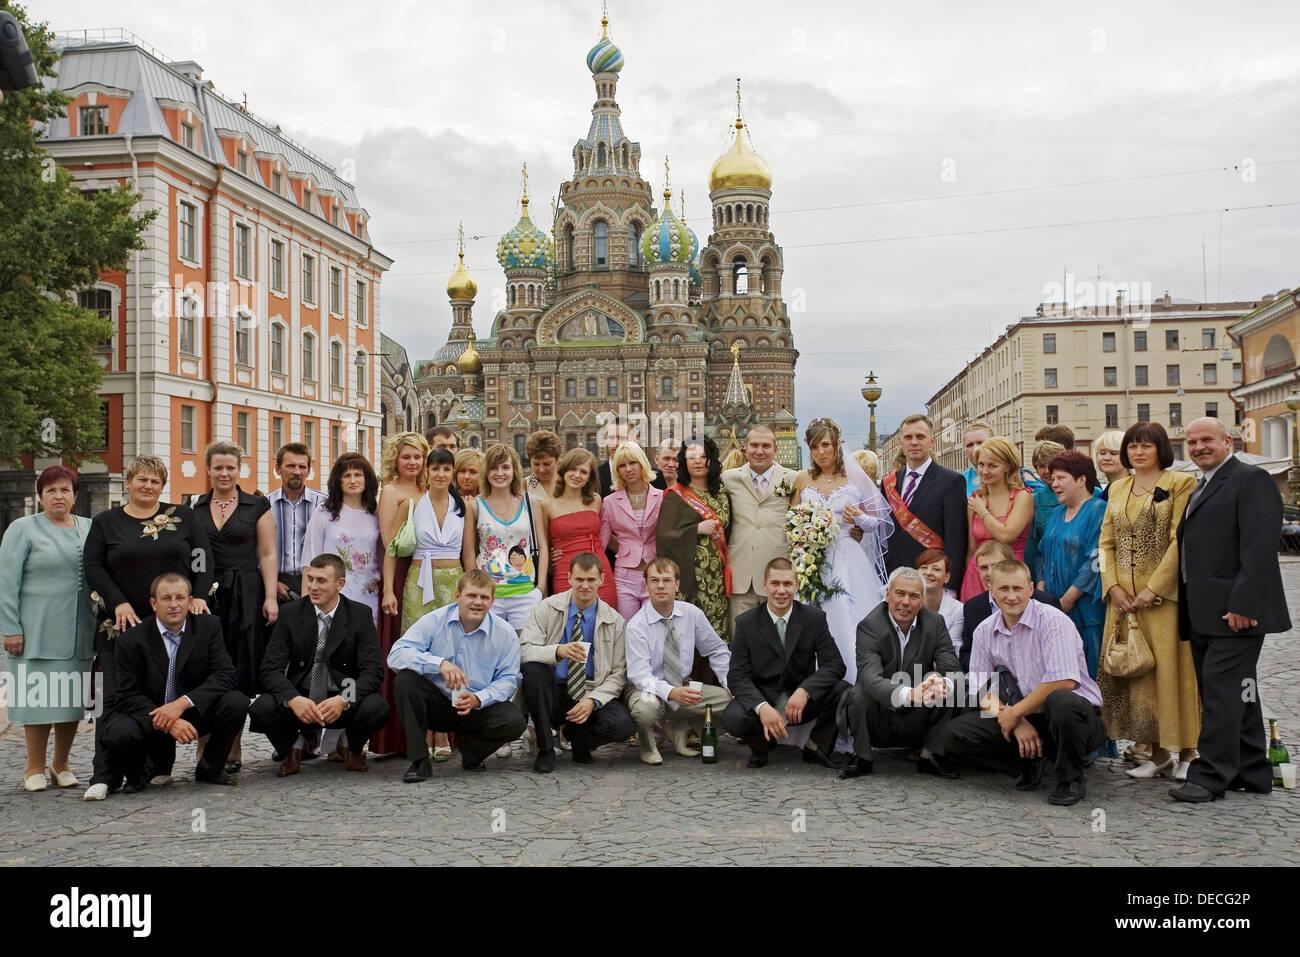 Church of the Bleeding Savior, Saint Petersburg, Russia Stock Photo